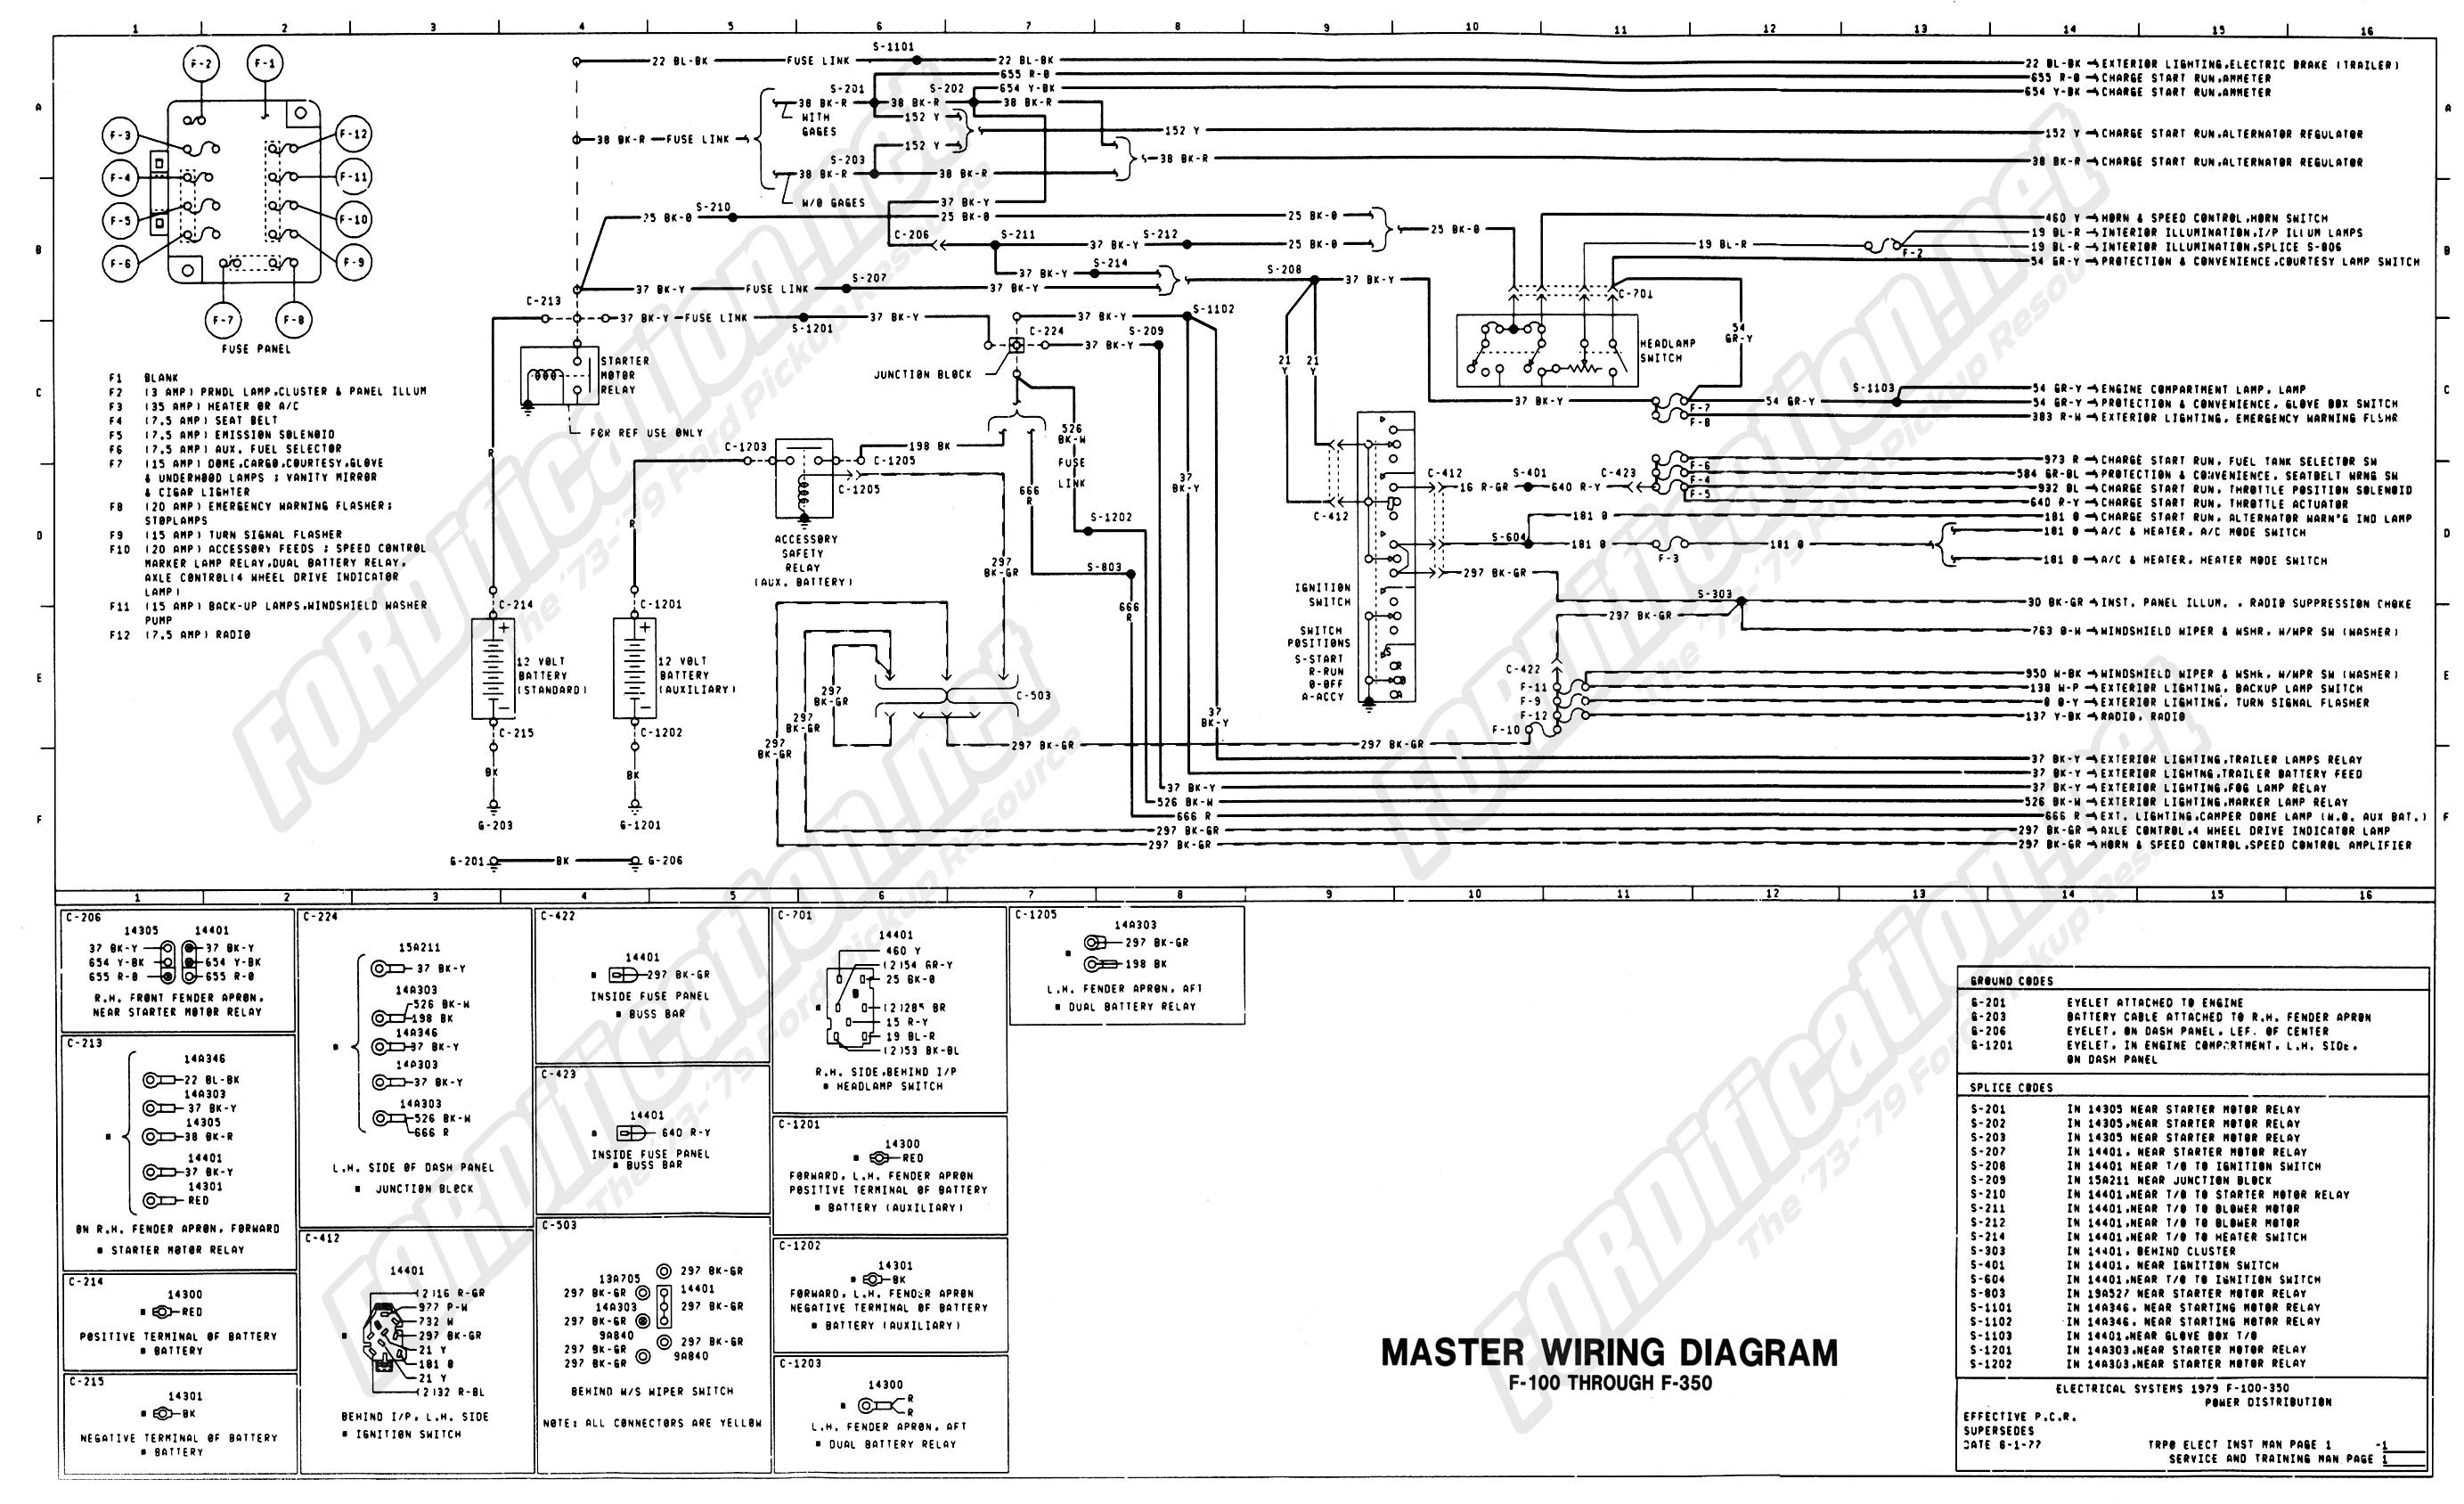 Ford F150 Engine Diagram 78 ford Truck Engine Diagram Of Ford F150 Engine Diagram